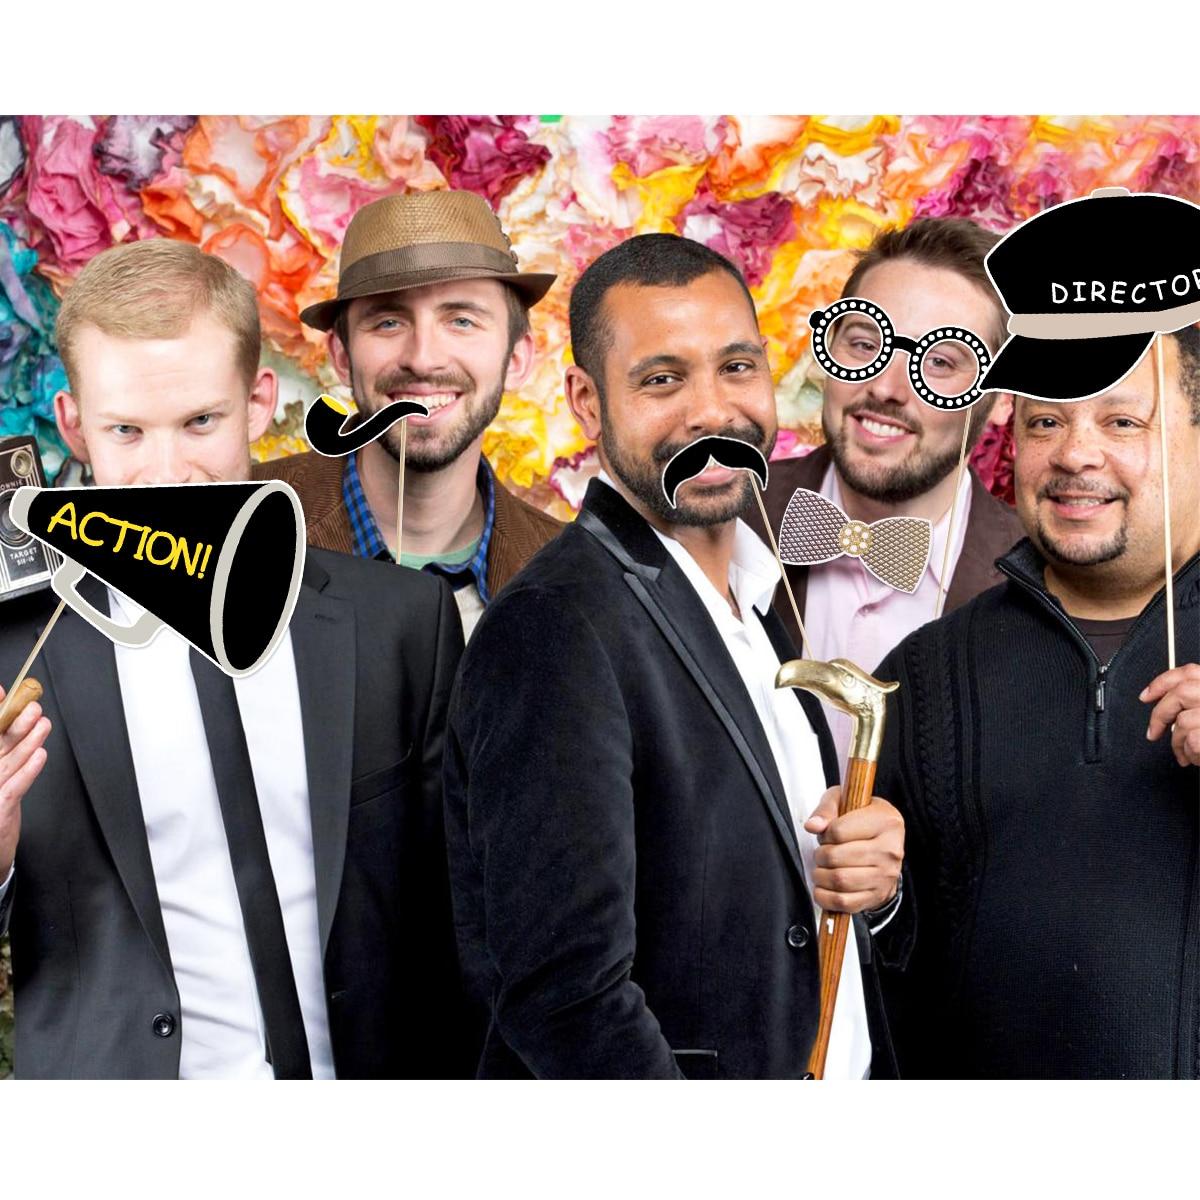 Tinksky 21Pcs Hollywood Stijl Party Masker Foto Props Bachelorette Party Wedding Decor Snor Verjaardag Feestartikelen - 5